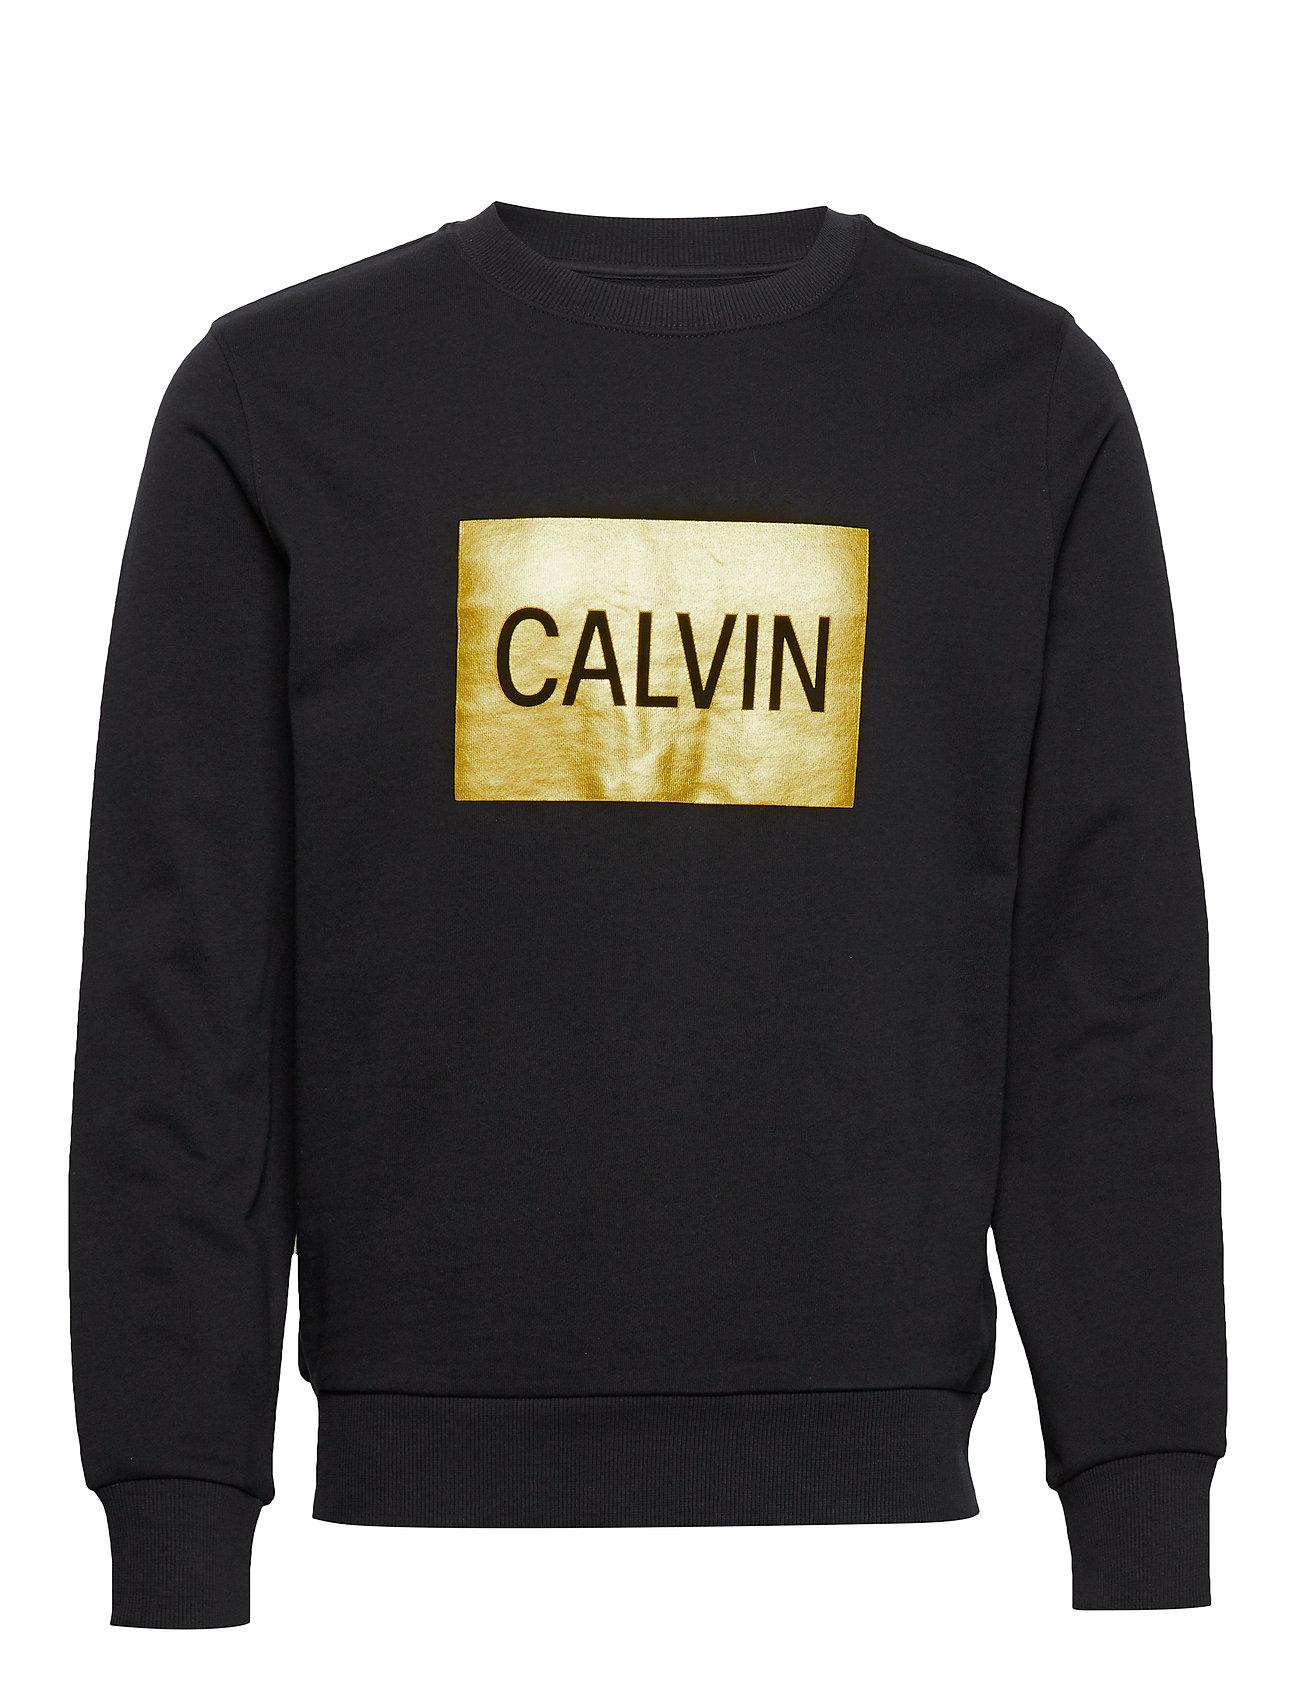 Calvin Klein Jeans CALVIN BOX REGULAR CREW NECK - CK BLACK / GOLD